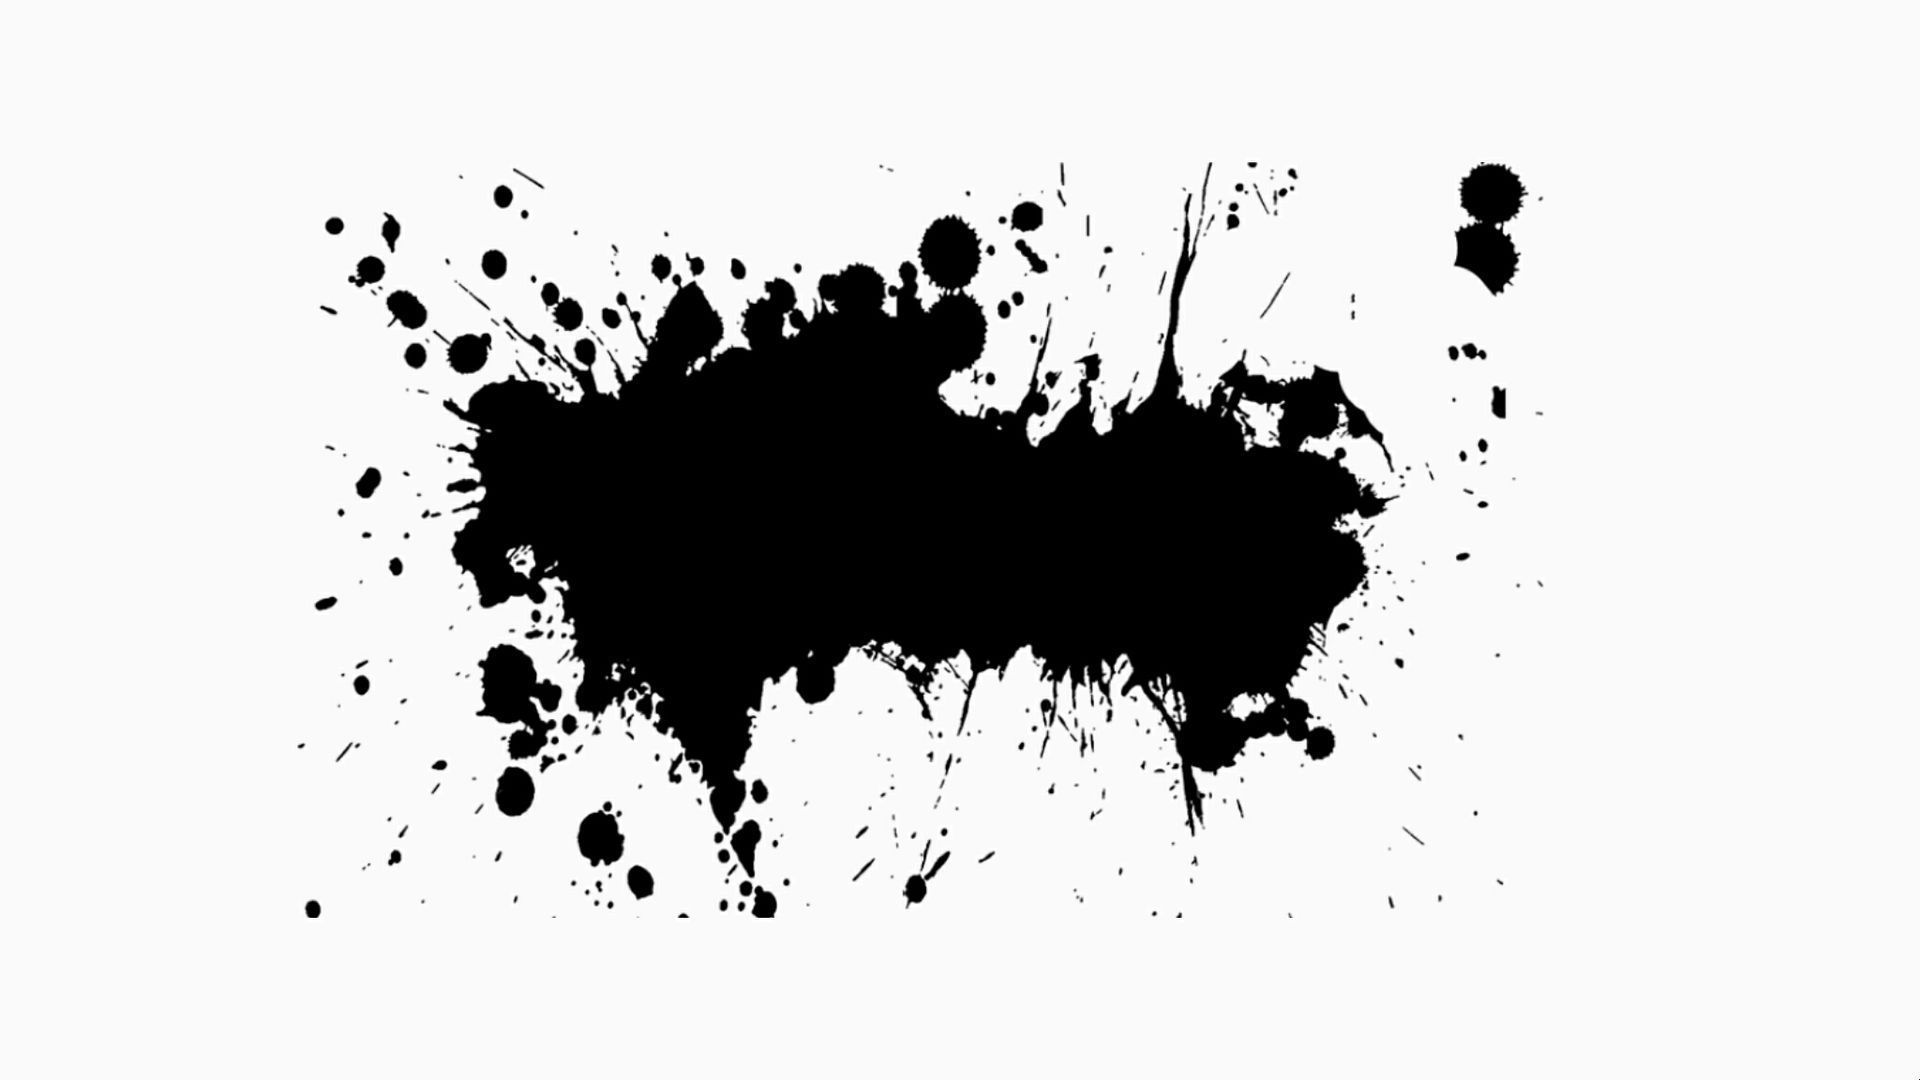 Templates For Covers Textures Black Ink Splatter Ink Splatter Watercolor Splash Png Black Background Painting